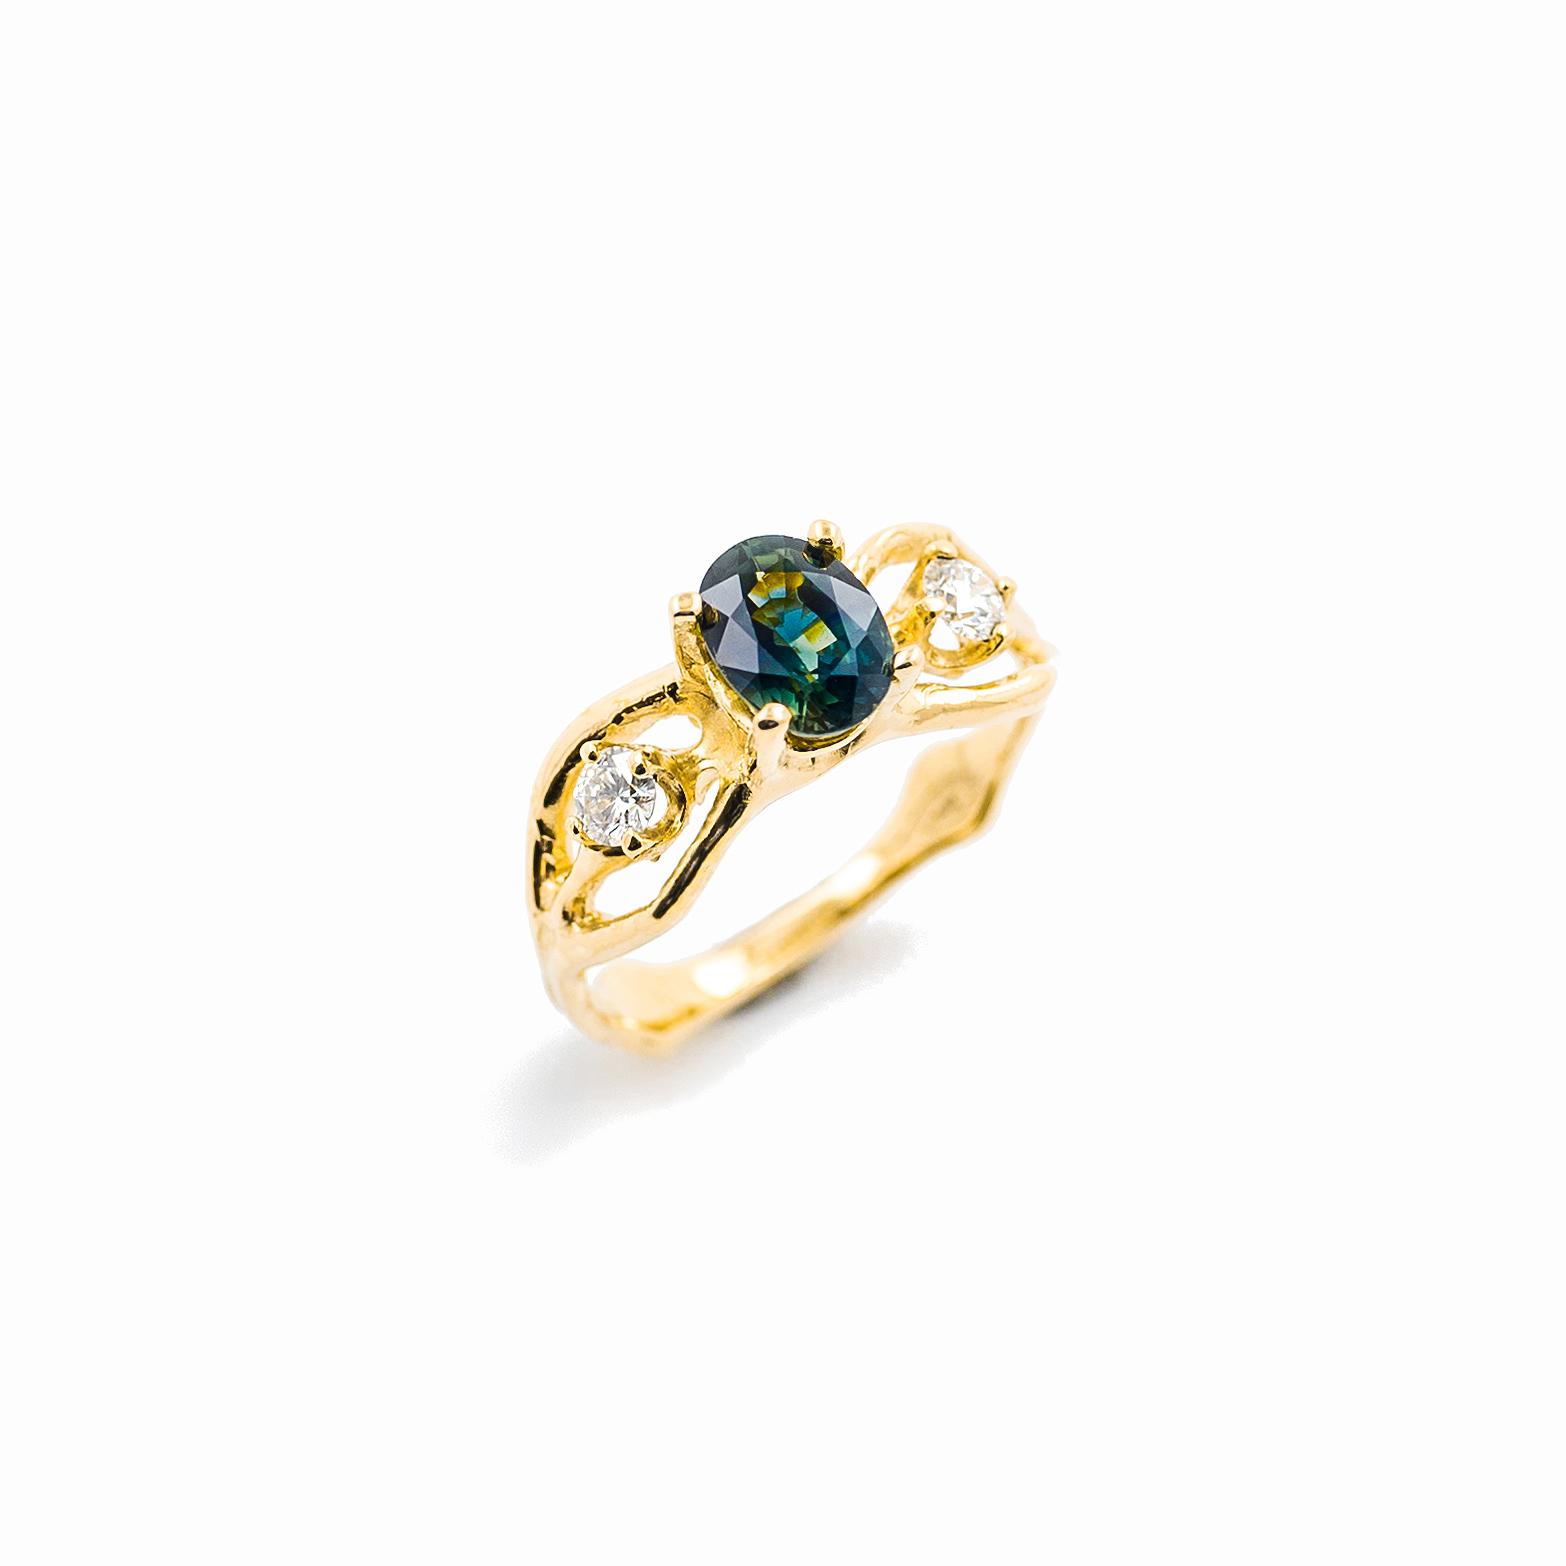 Unfolding Ring | 18ct yellow gold, sapphire, white diamonds.